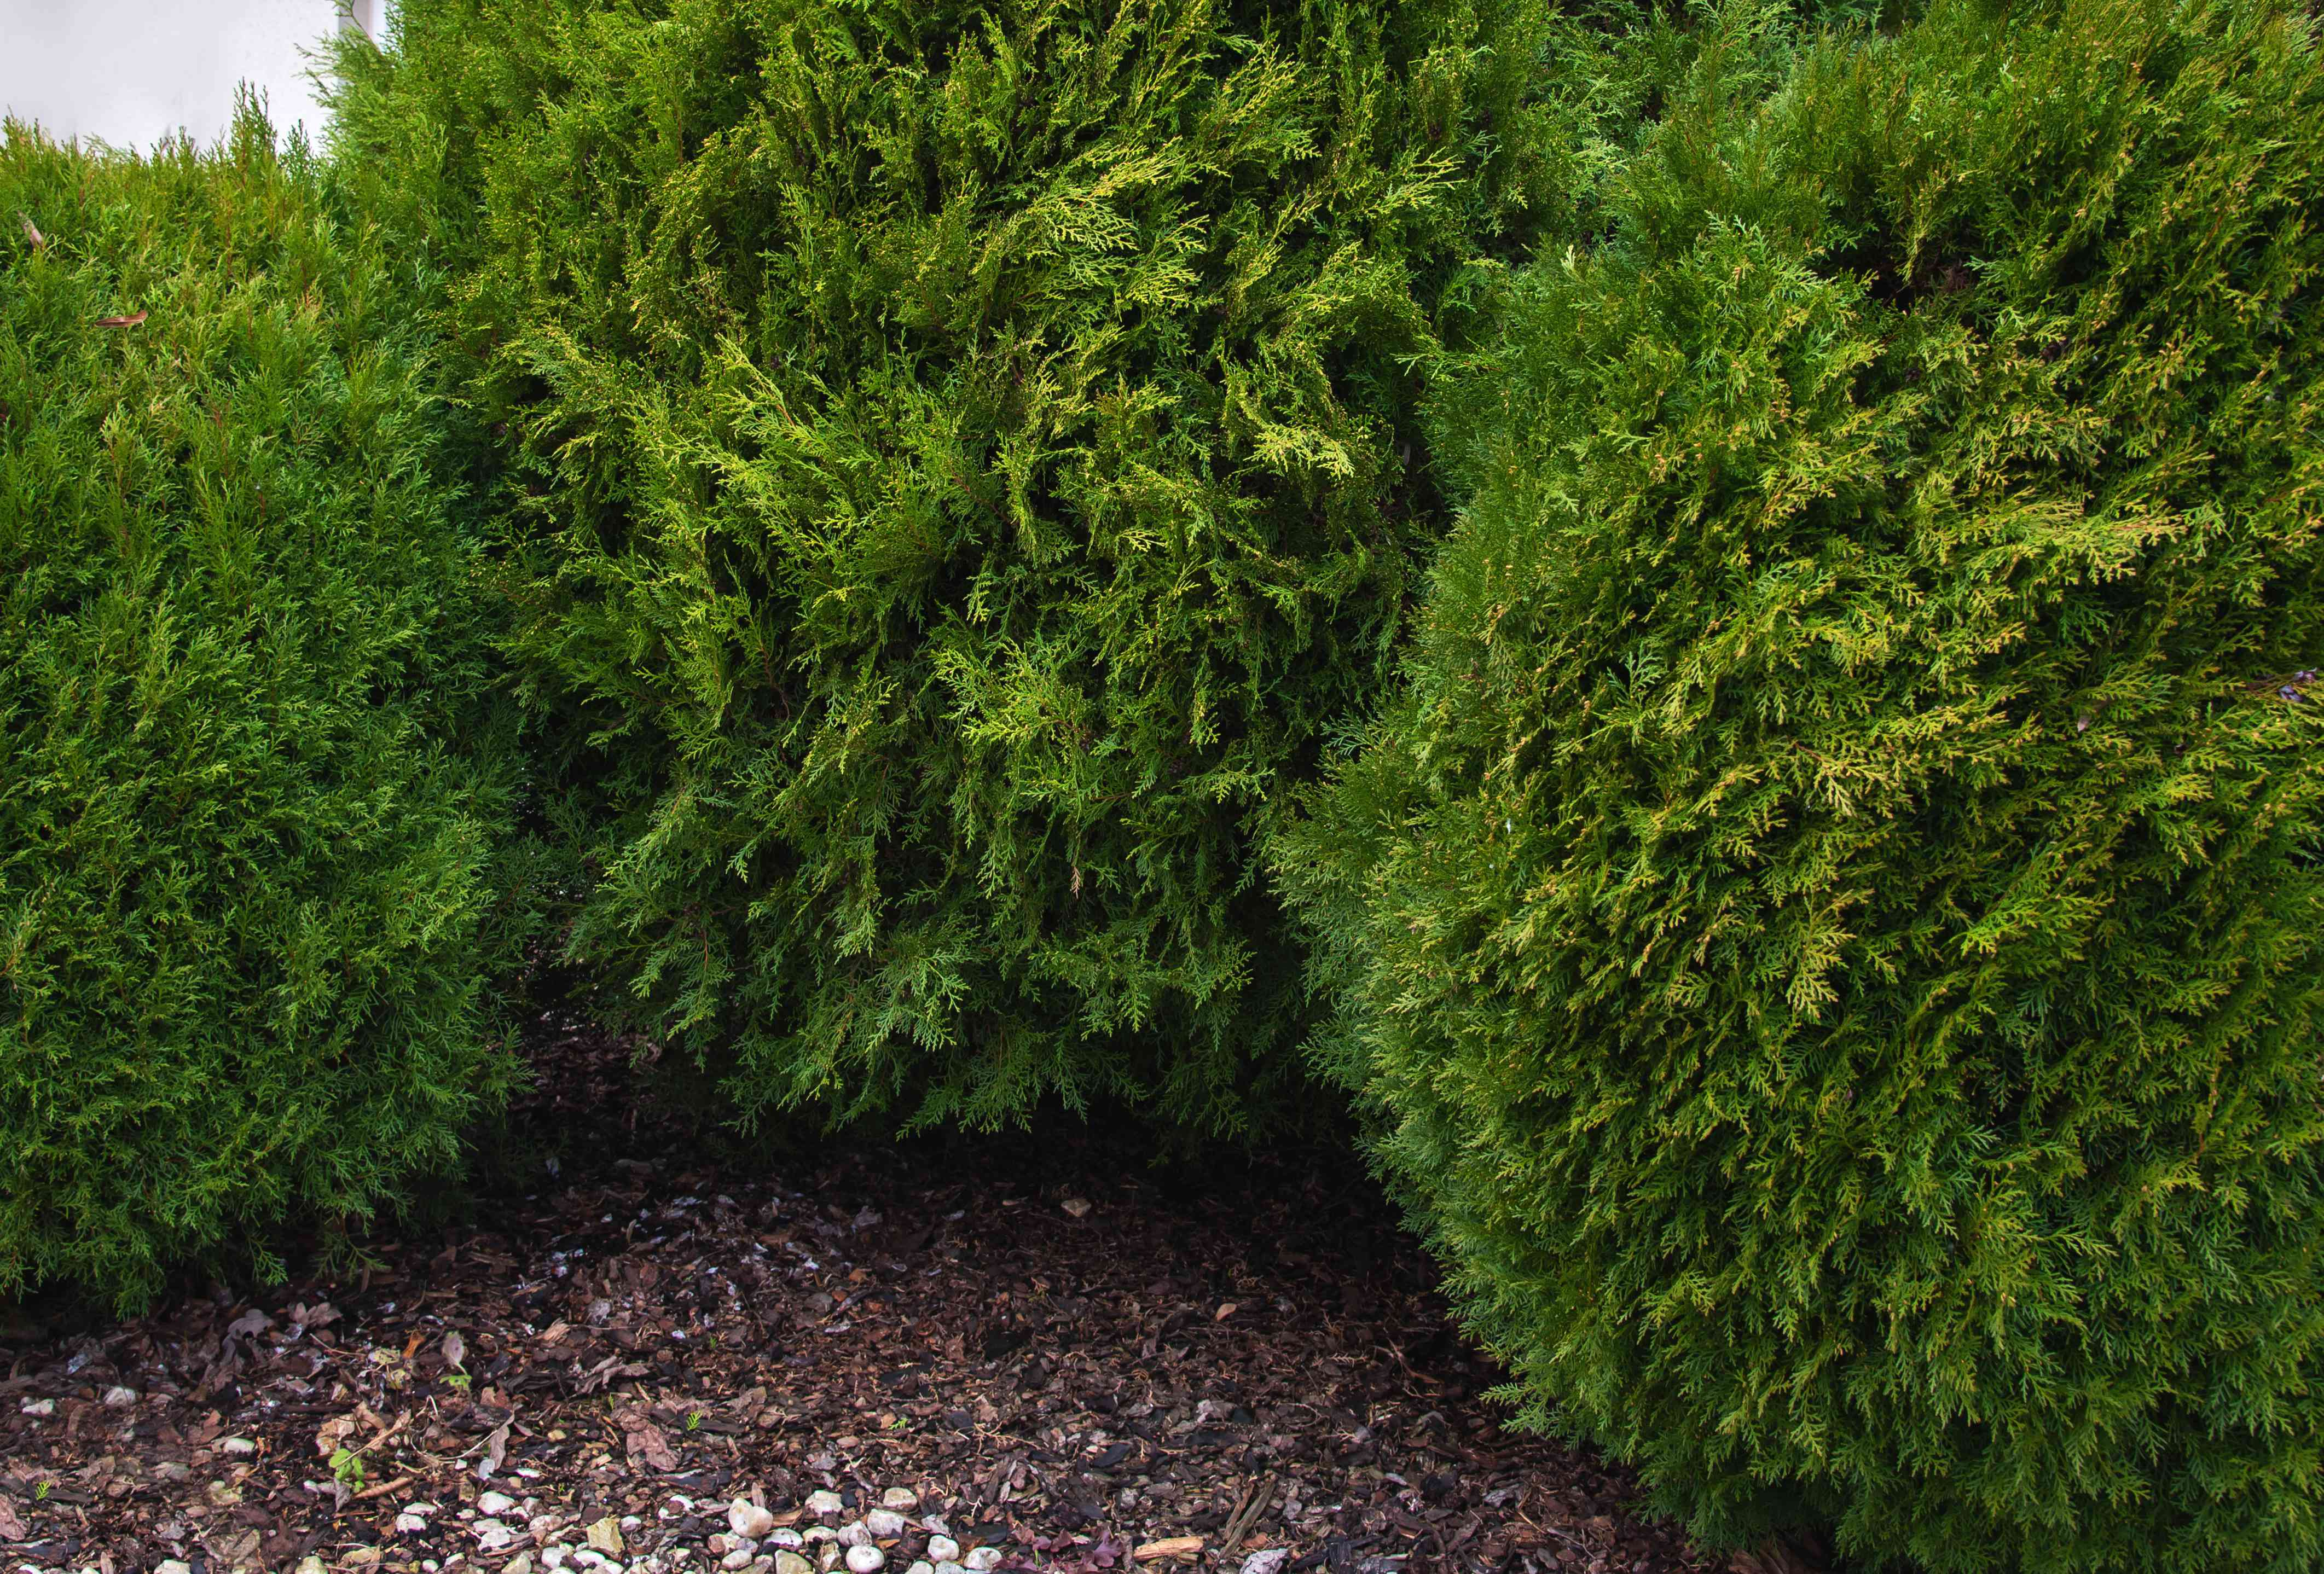 Tall arborvitae shrubs as topiary plants